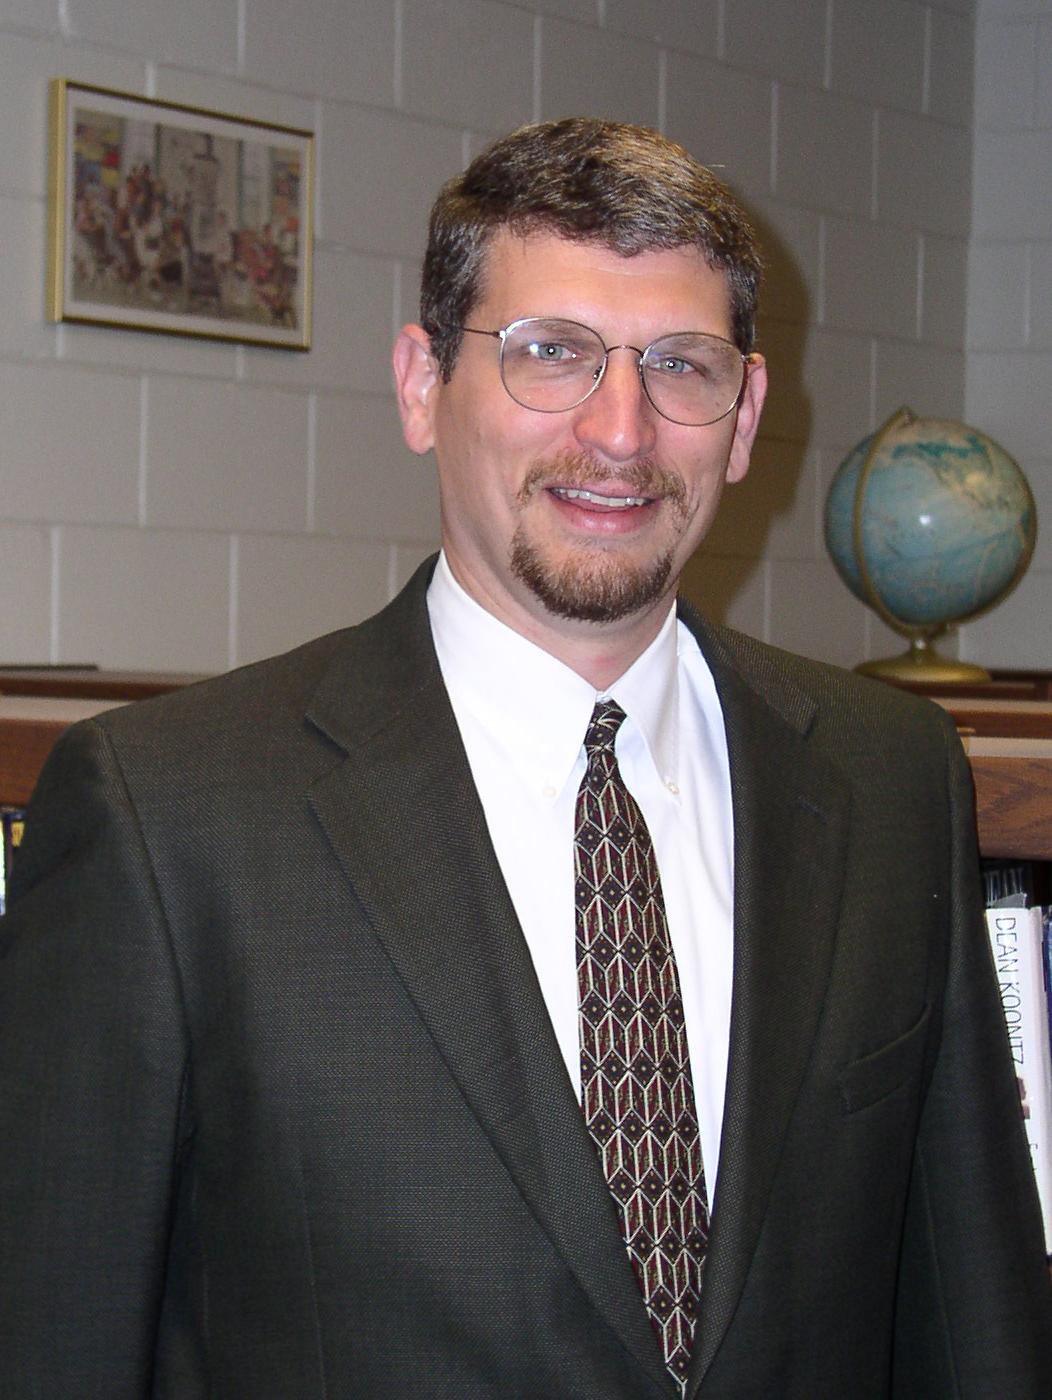 Mr. Grubbs